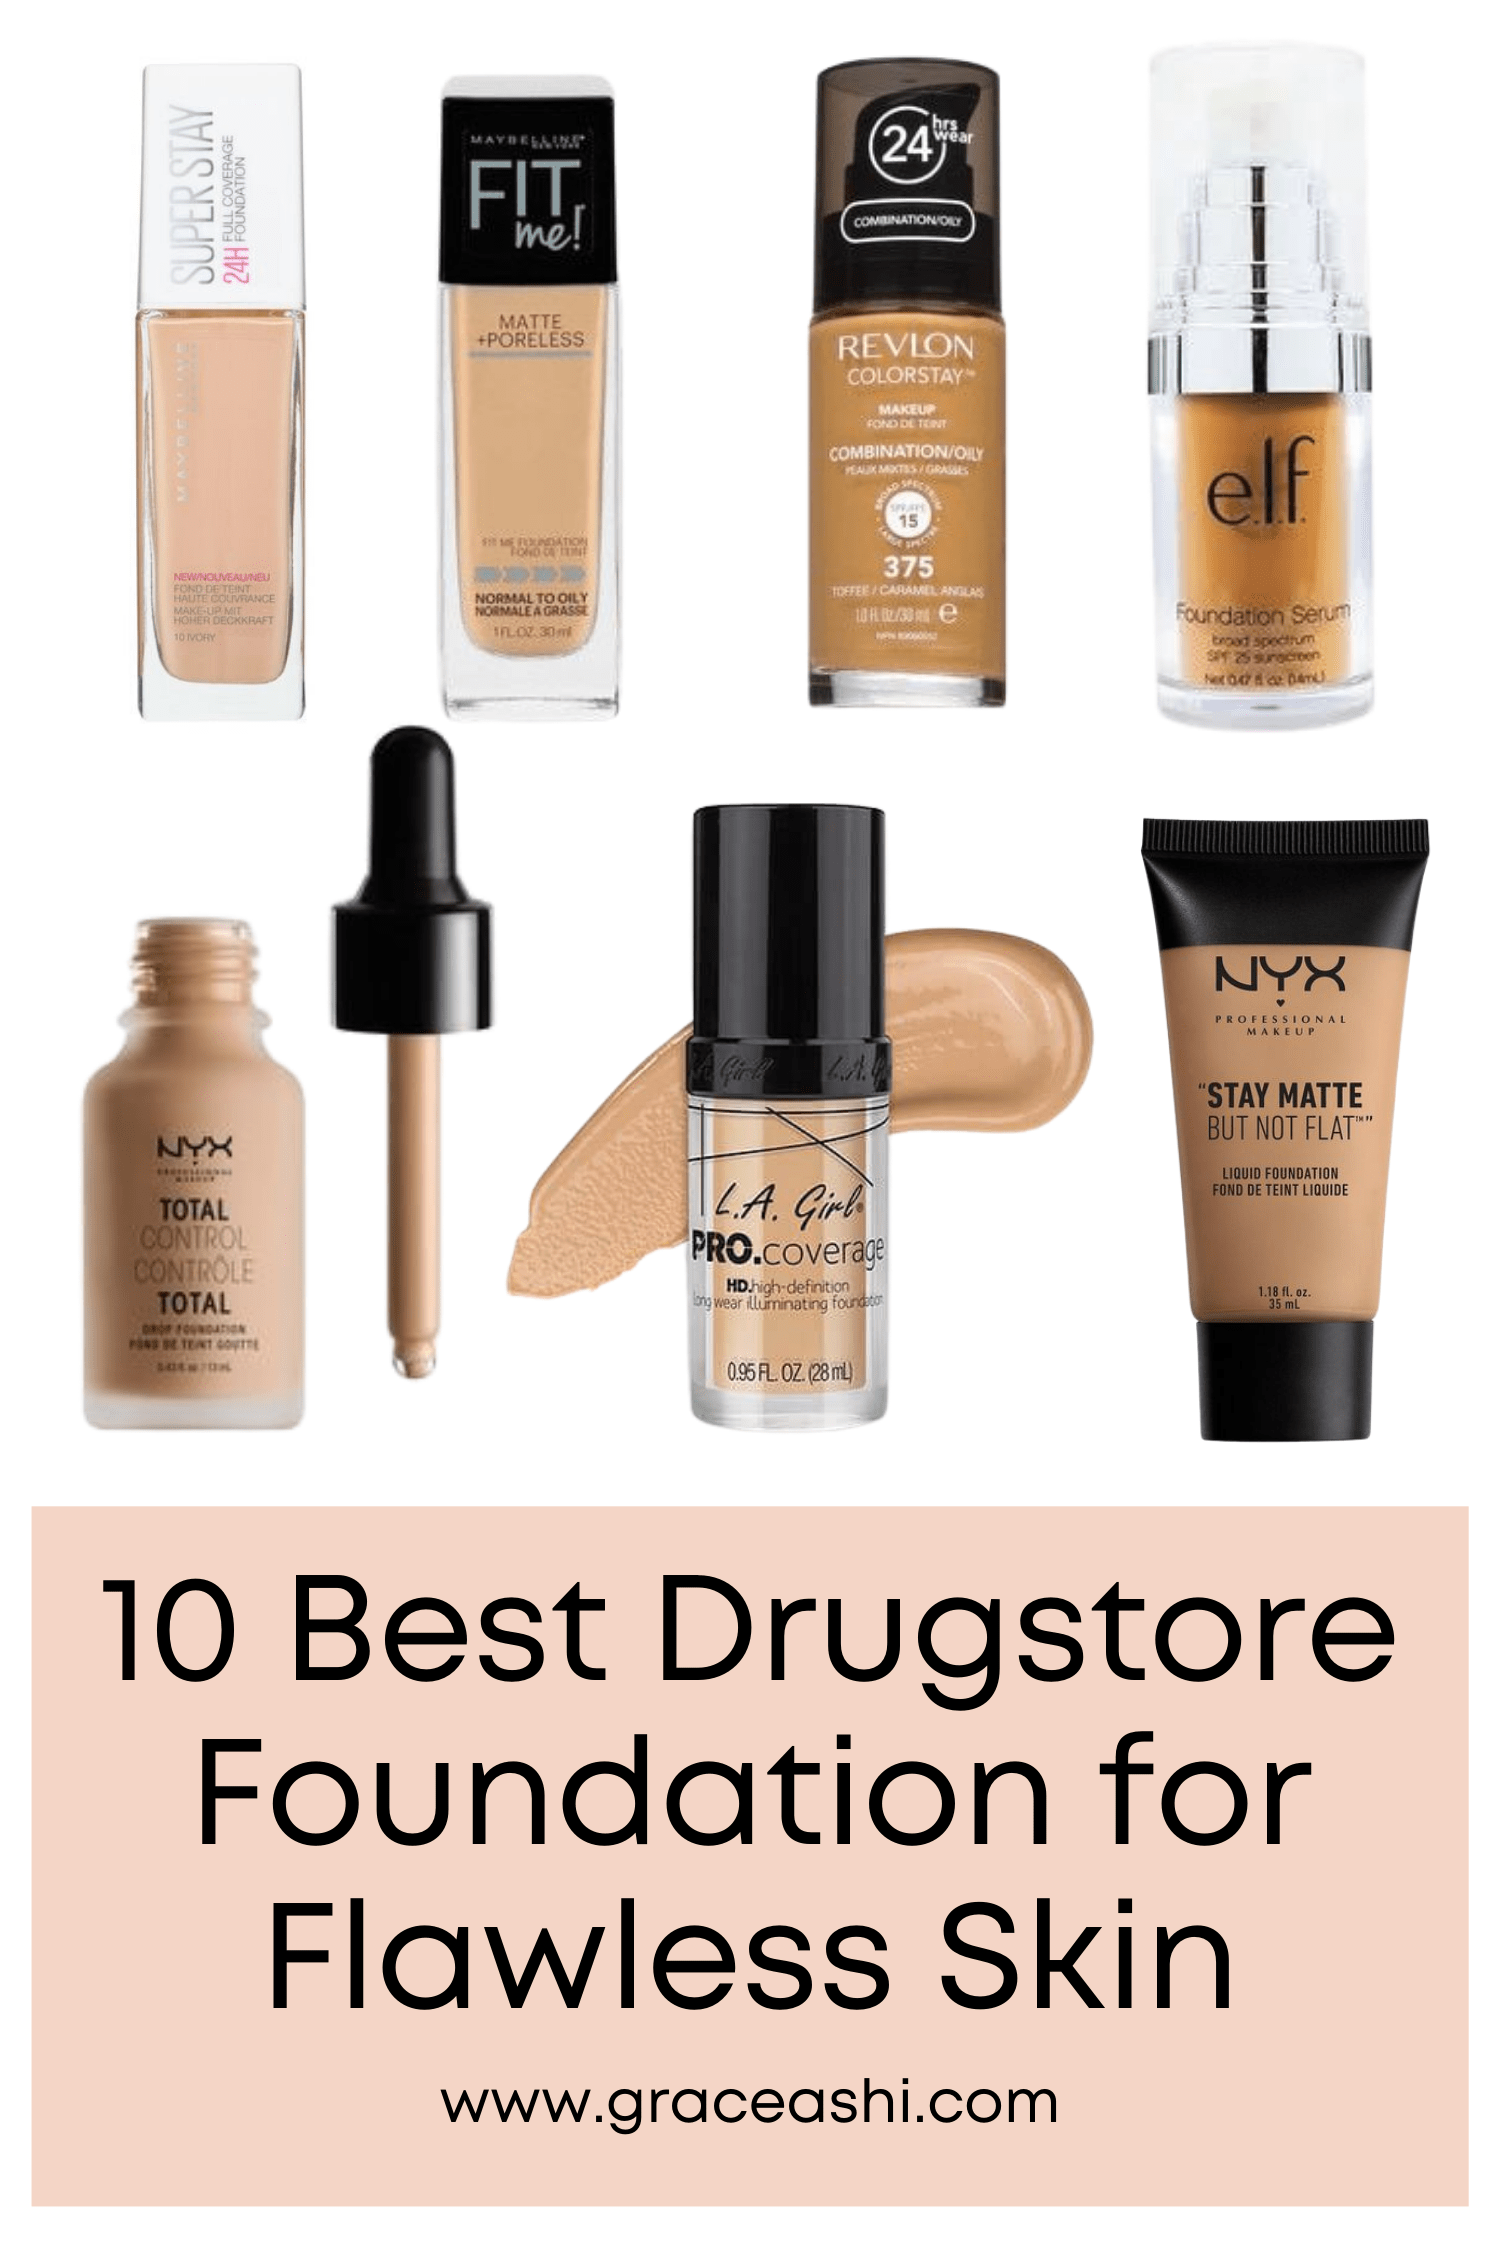 10 Best Drugstore Foundation for Flawless Skin in 2020